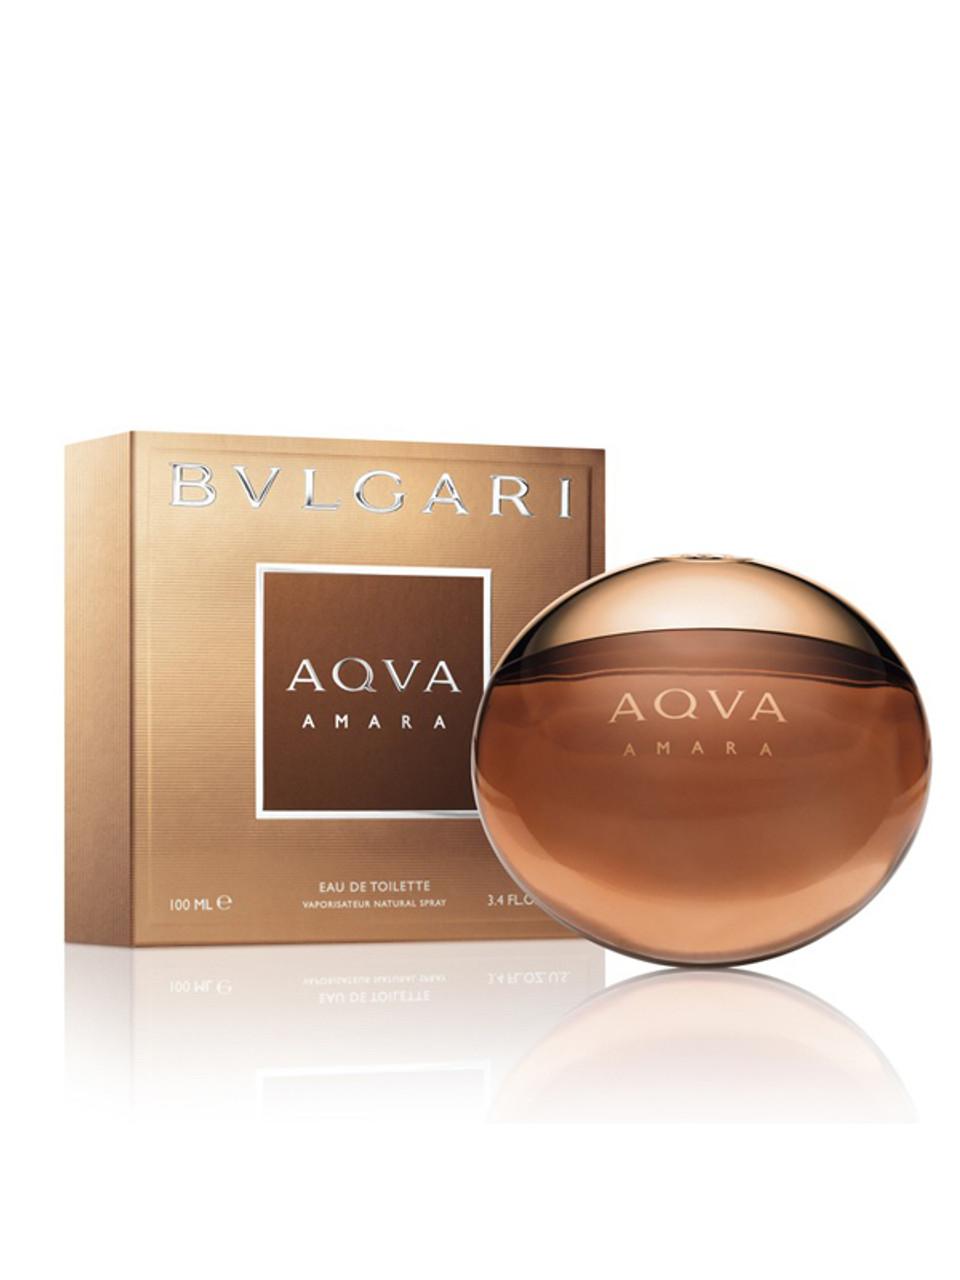 Hypermoderne Bvlgari Aqva Amara By Bvlgari For Men - Perfume X VL-42